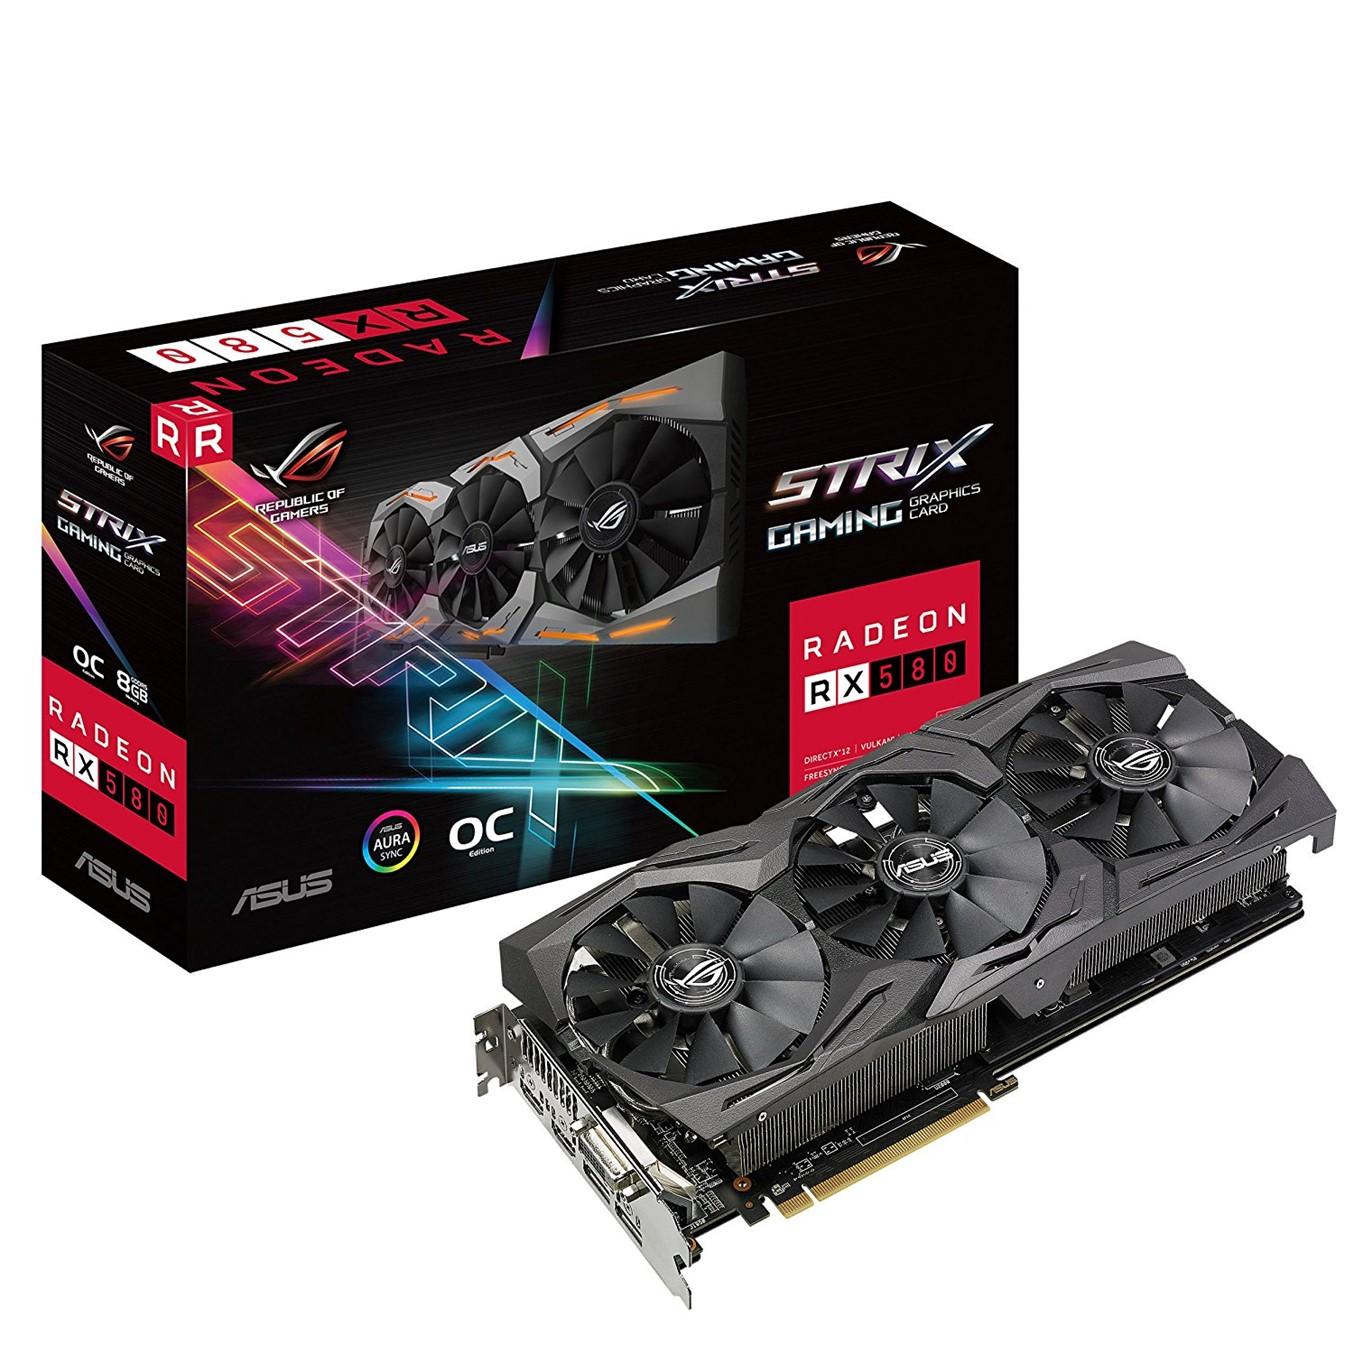 TARJETA GRAFICA ASUS AMD ROG STRIX-RX580-T8G GAMING